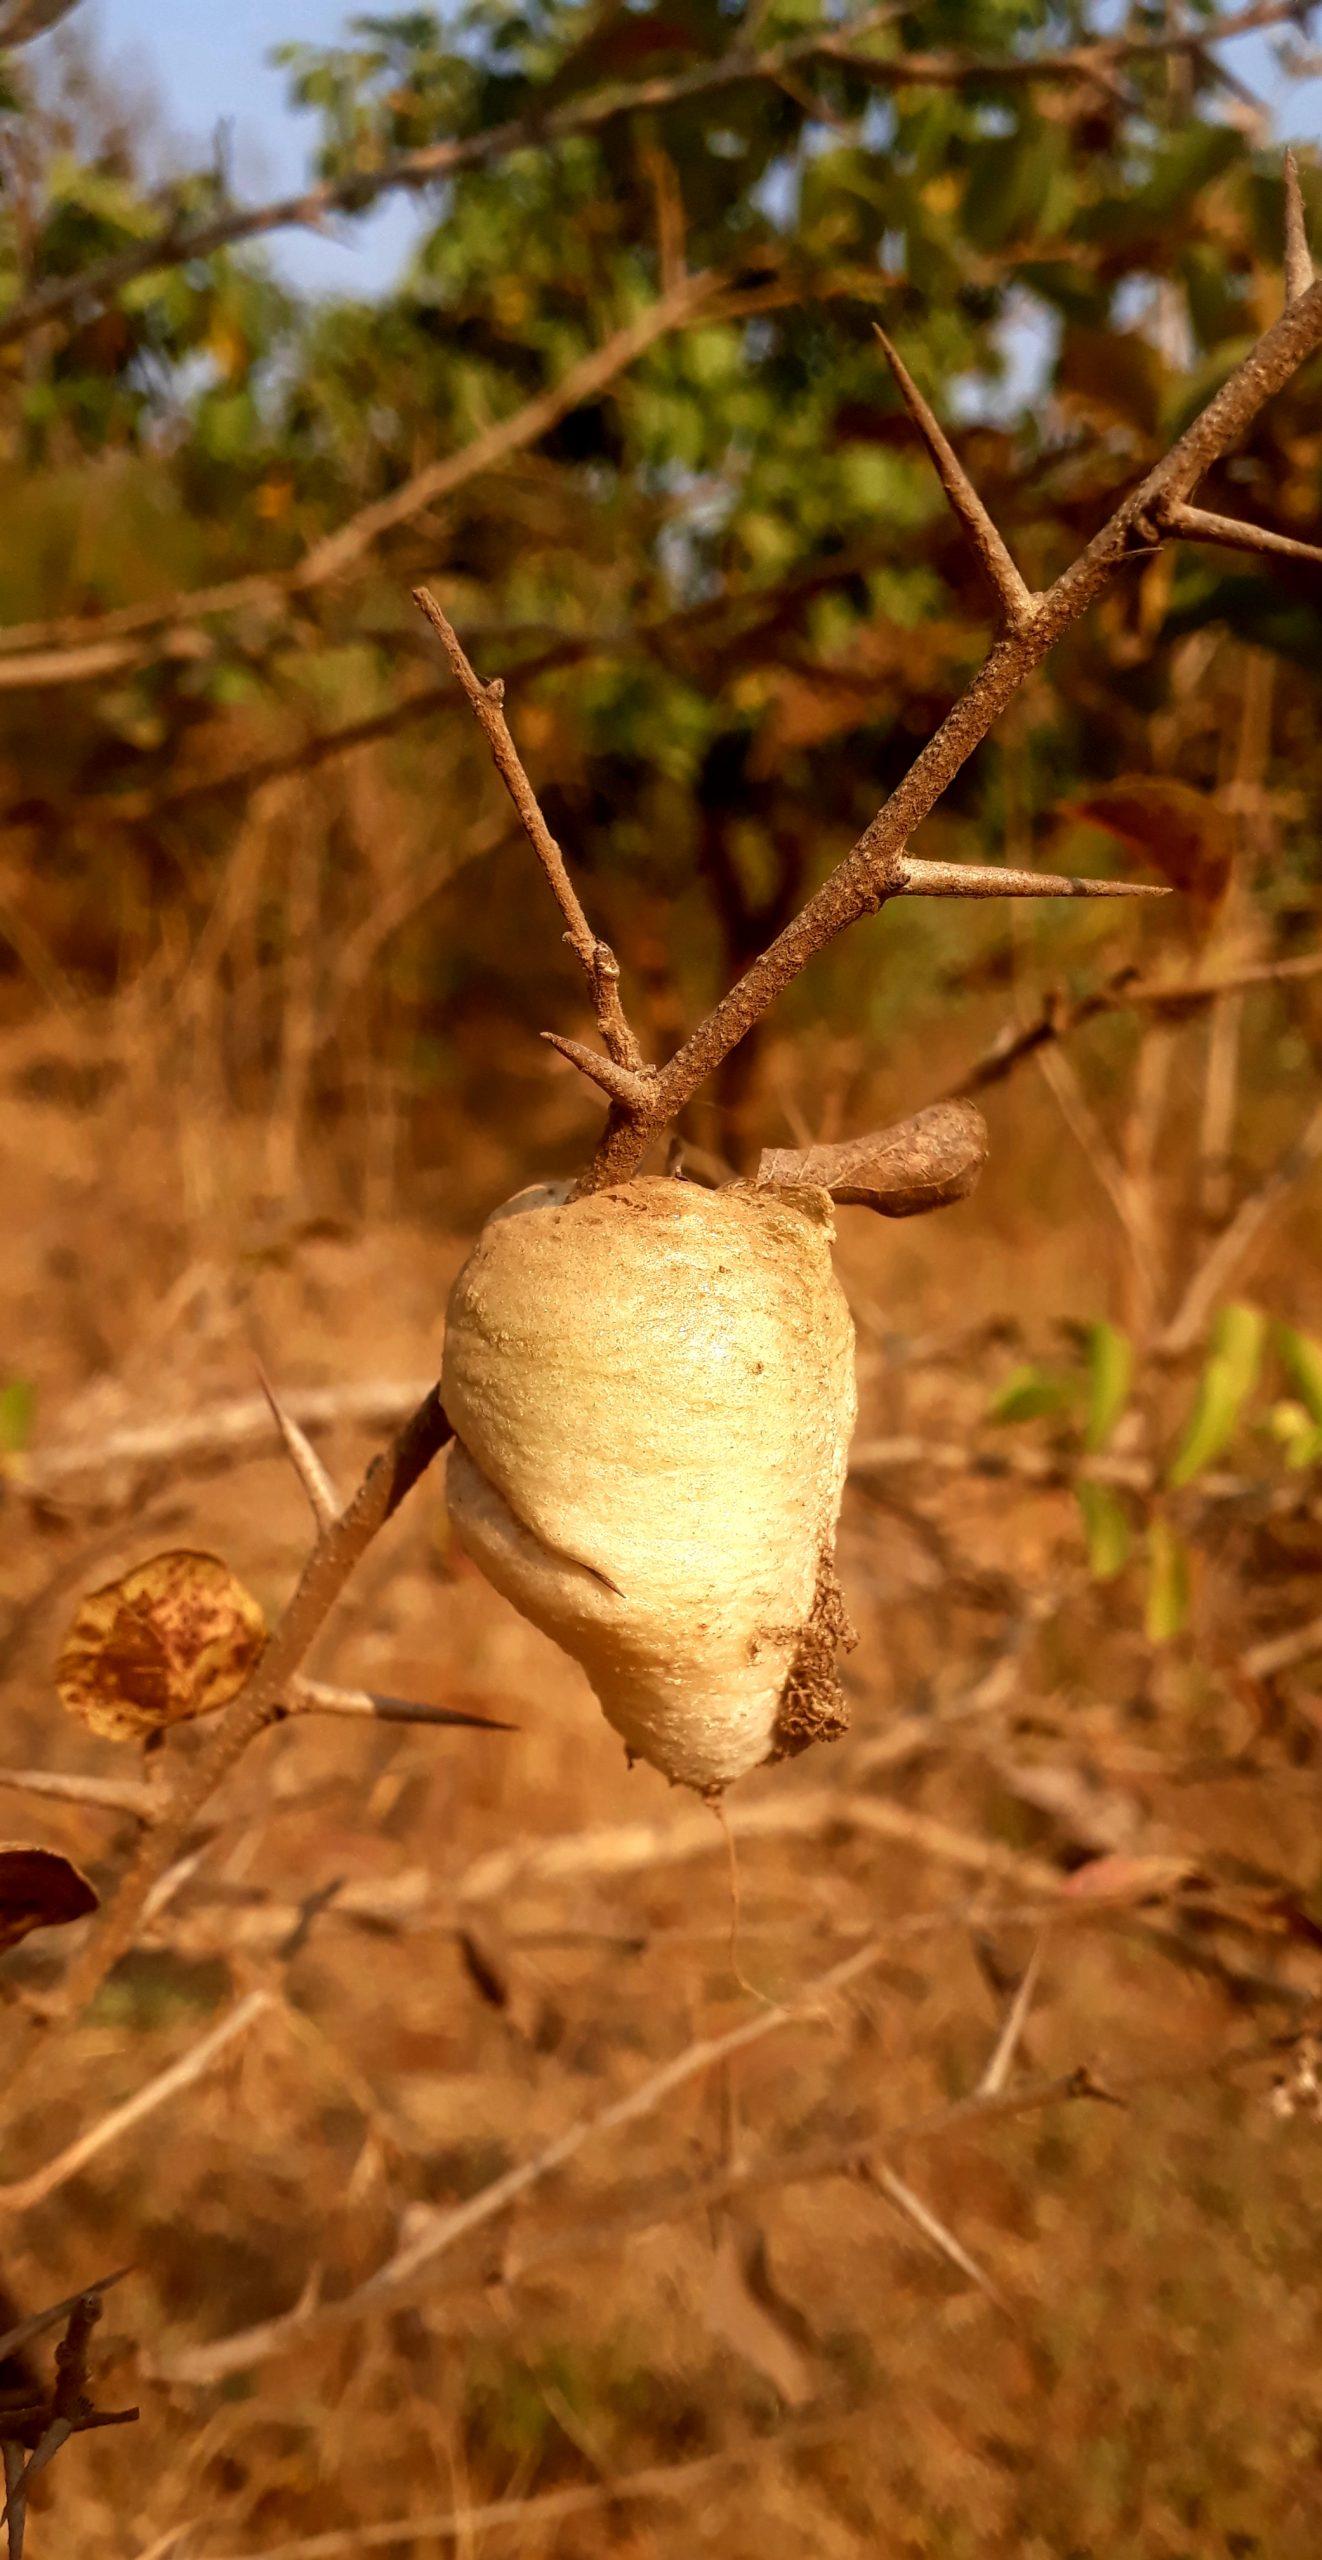 A caterpillar cocoon